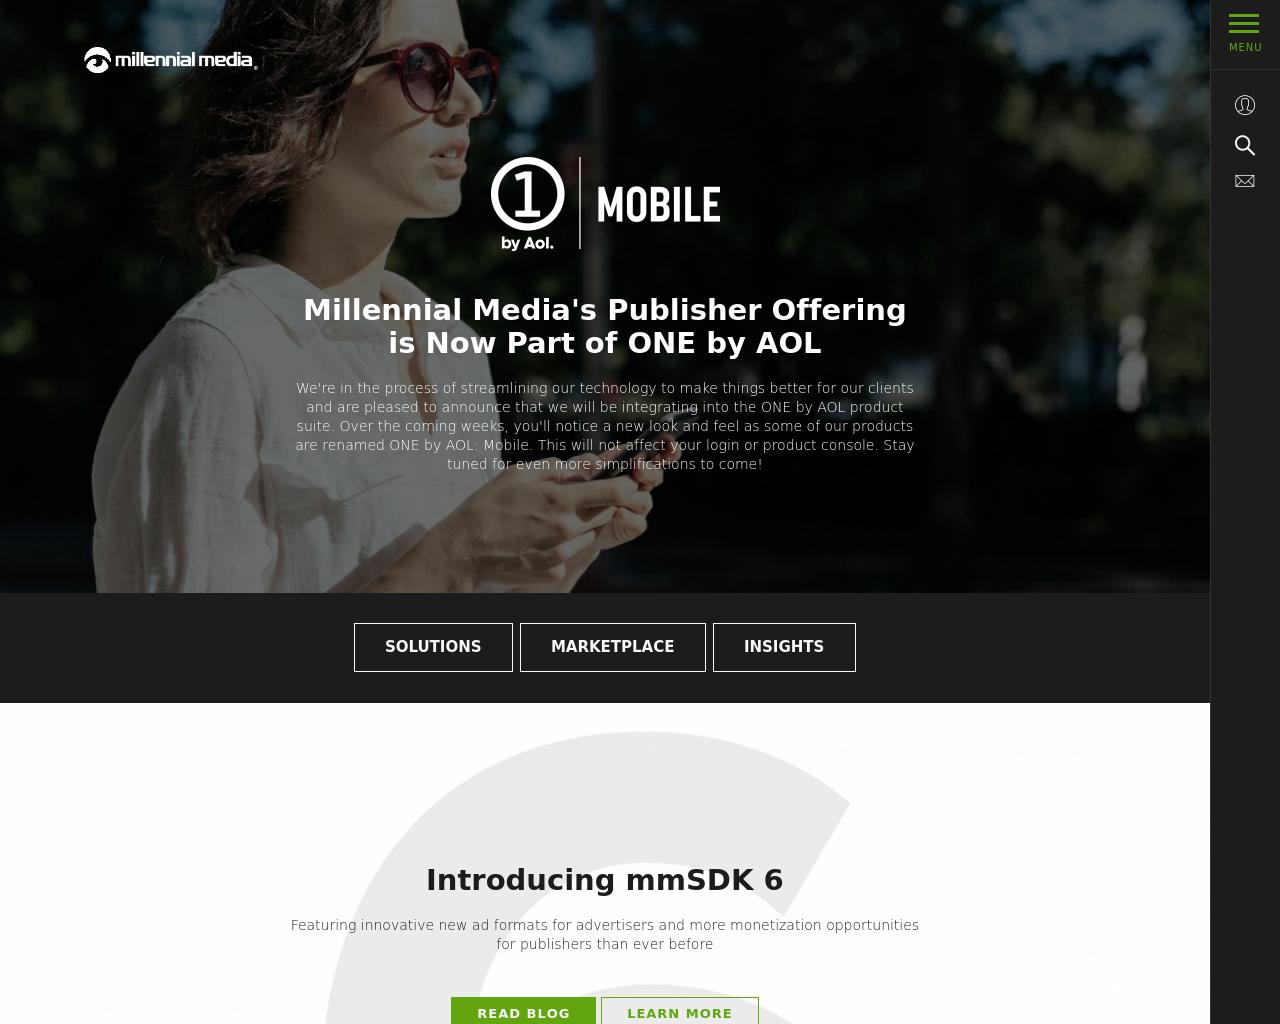 Millennial-Media-Advertising-Reviews-Pricing